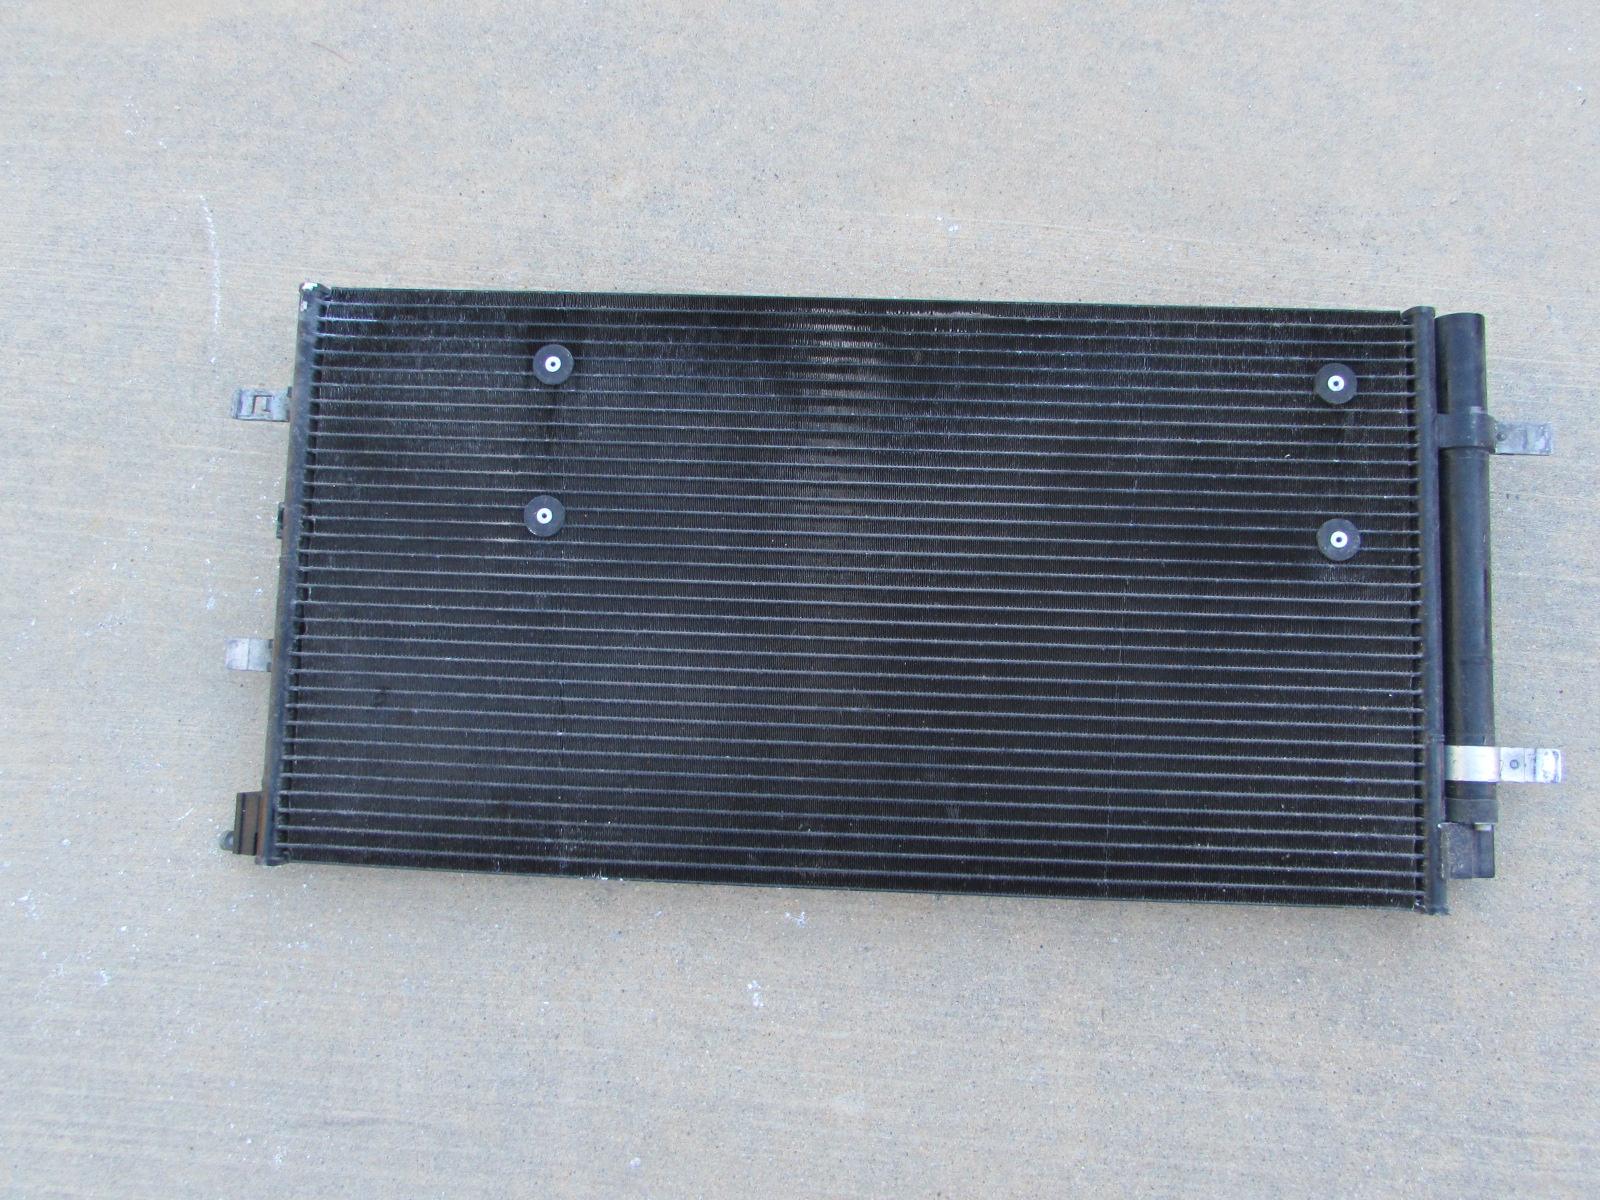 Audi OEM A4 B8 AC Air Conditioner Conditioning Condenser 8K0260403E  8K0260403E 2008 2009 2010 2011 2012 A4 S4 Q5 A5 S5